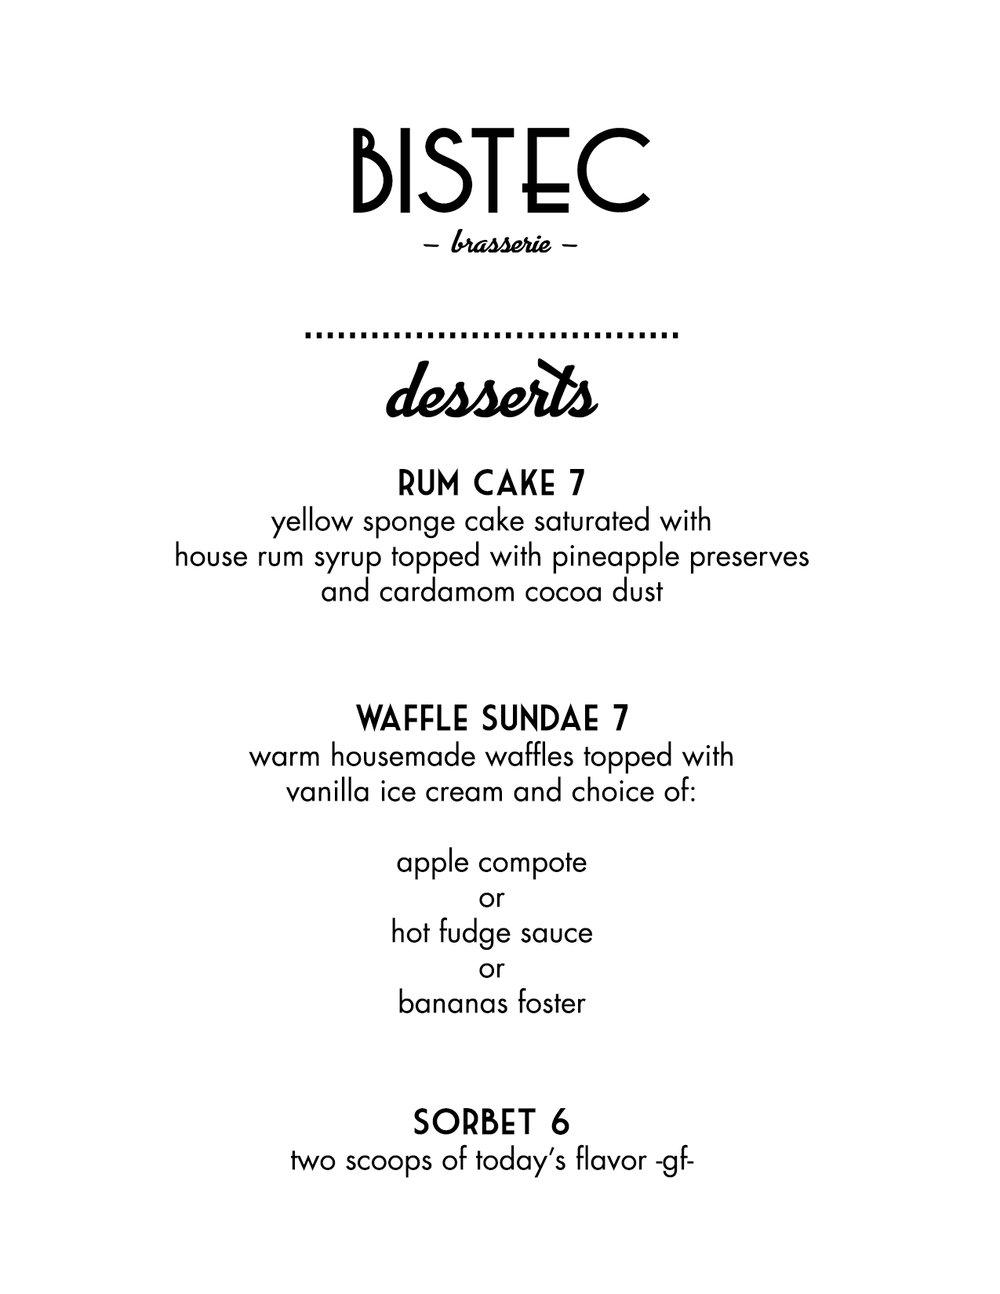 Bistec Dessert Menu.jpg